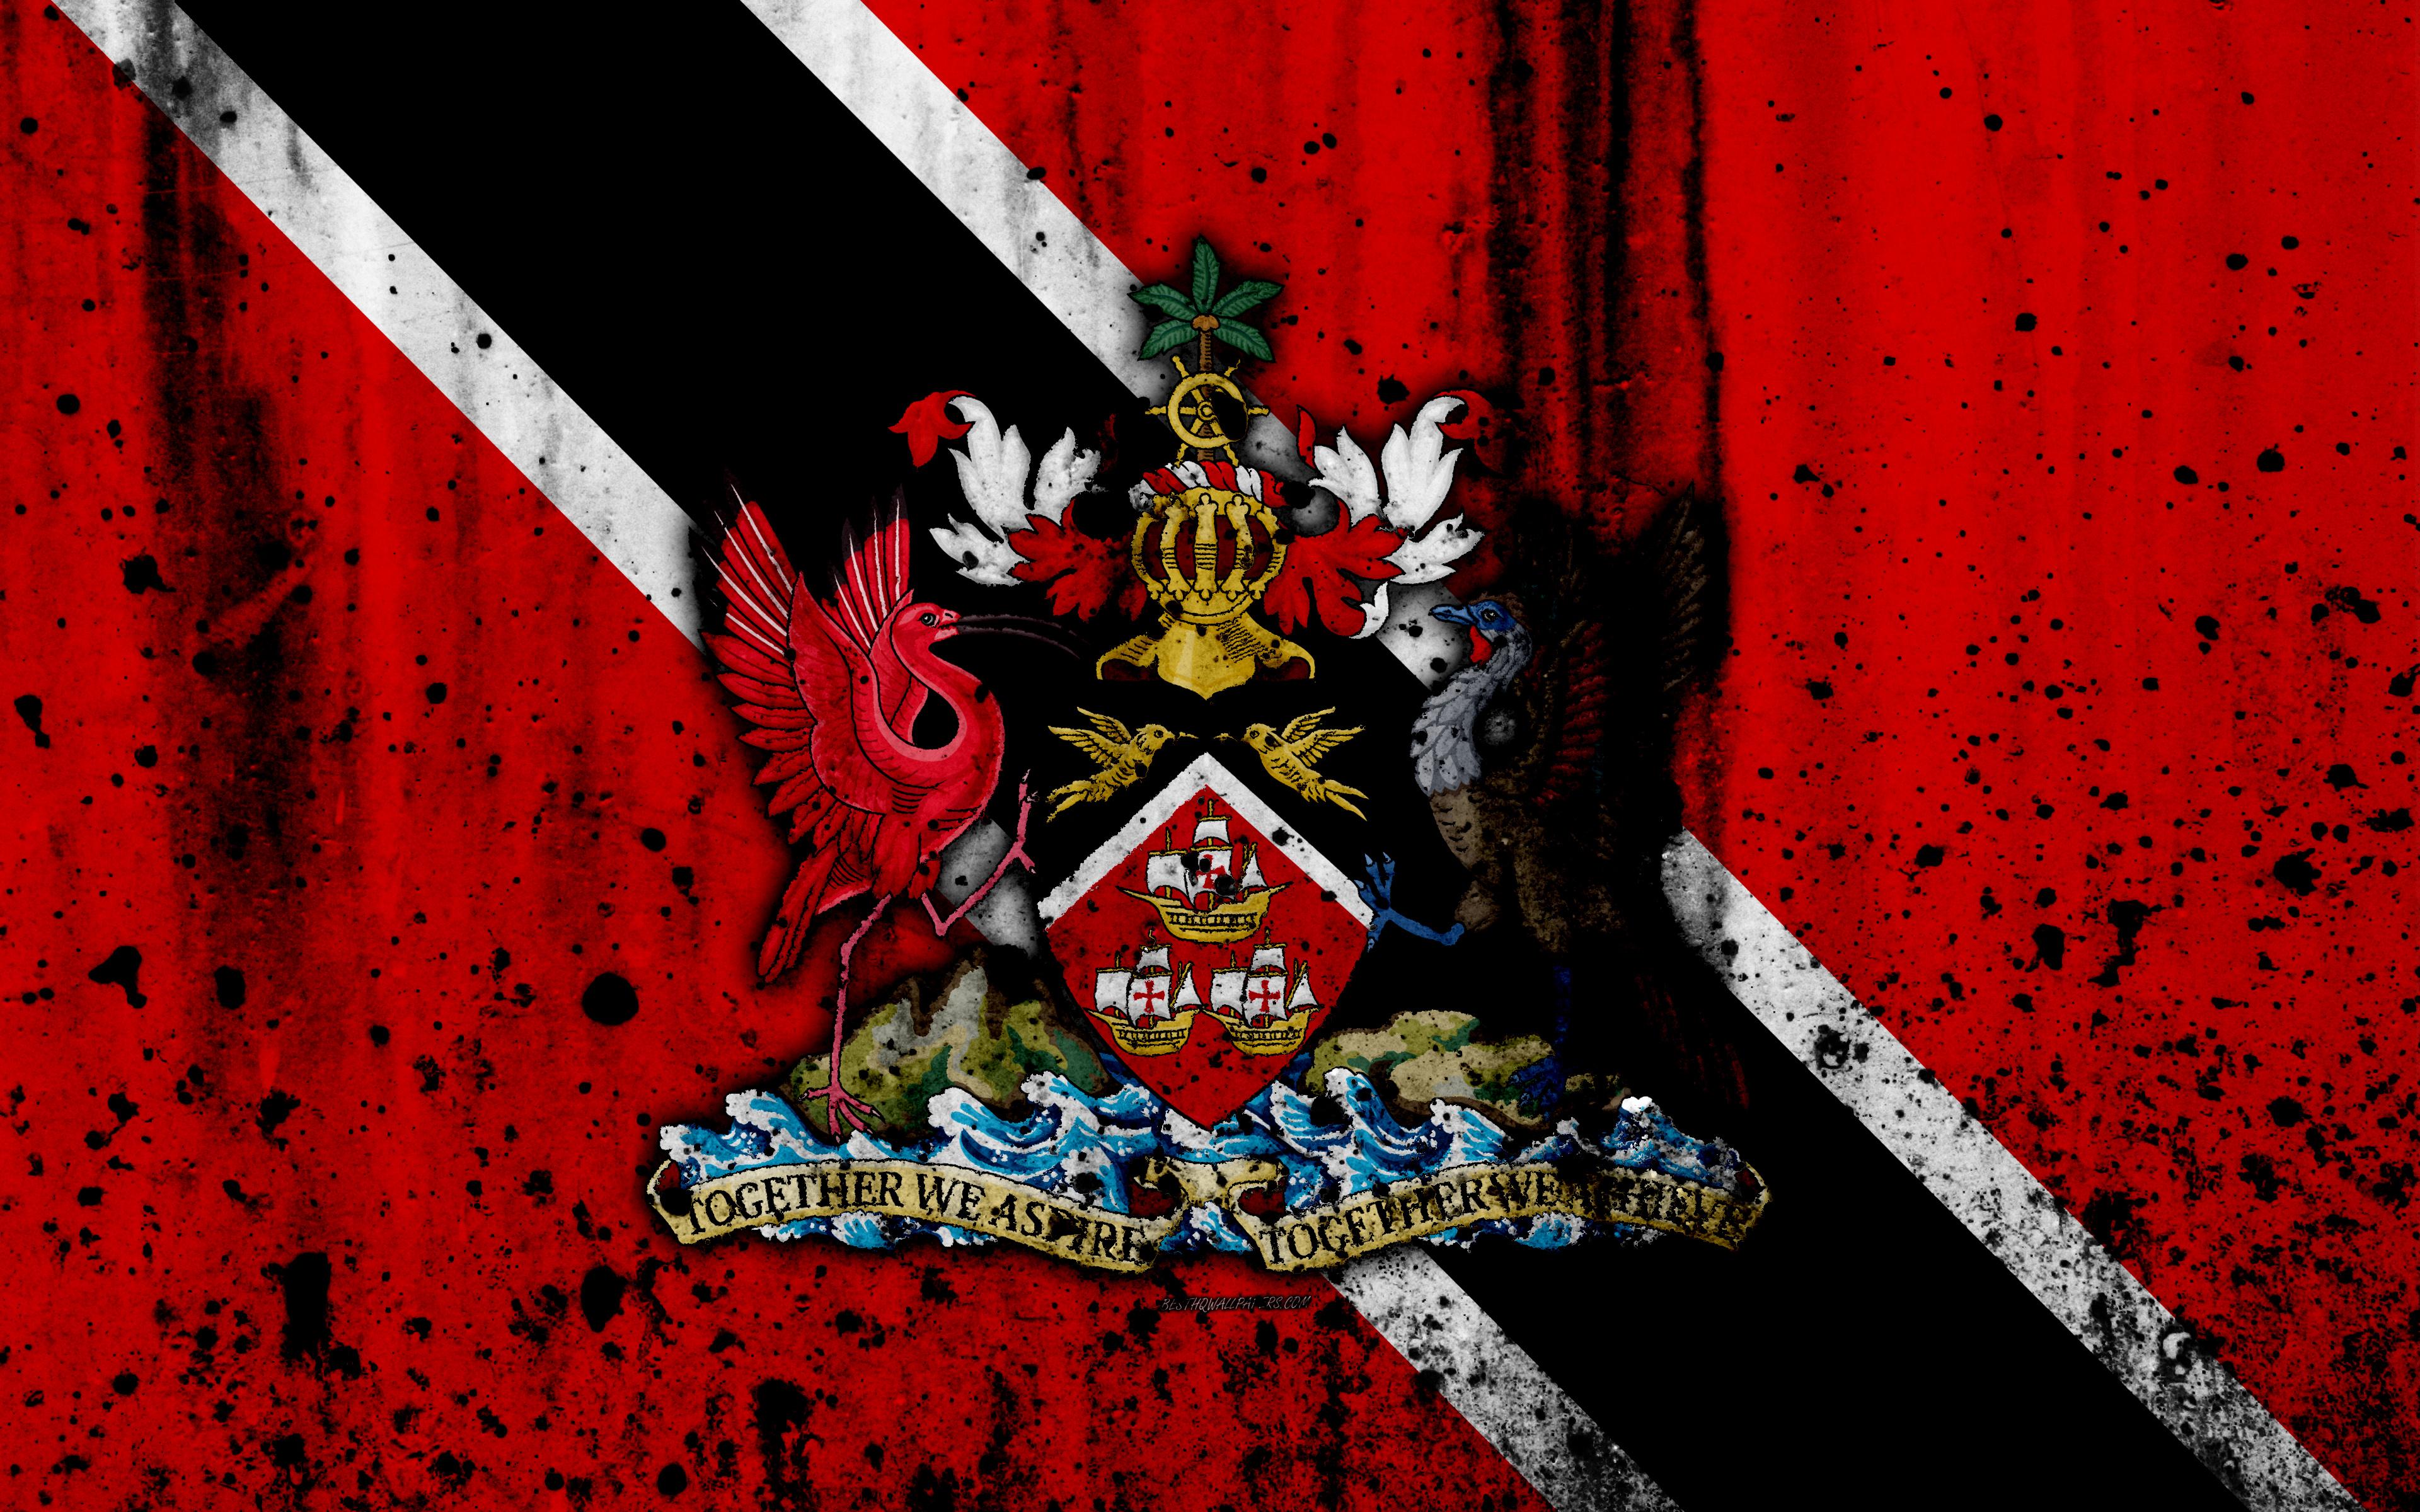 Download wallpapers Trinidad and Tobago flag 4k grunge North 3840x2400